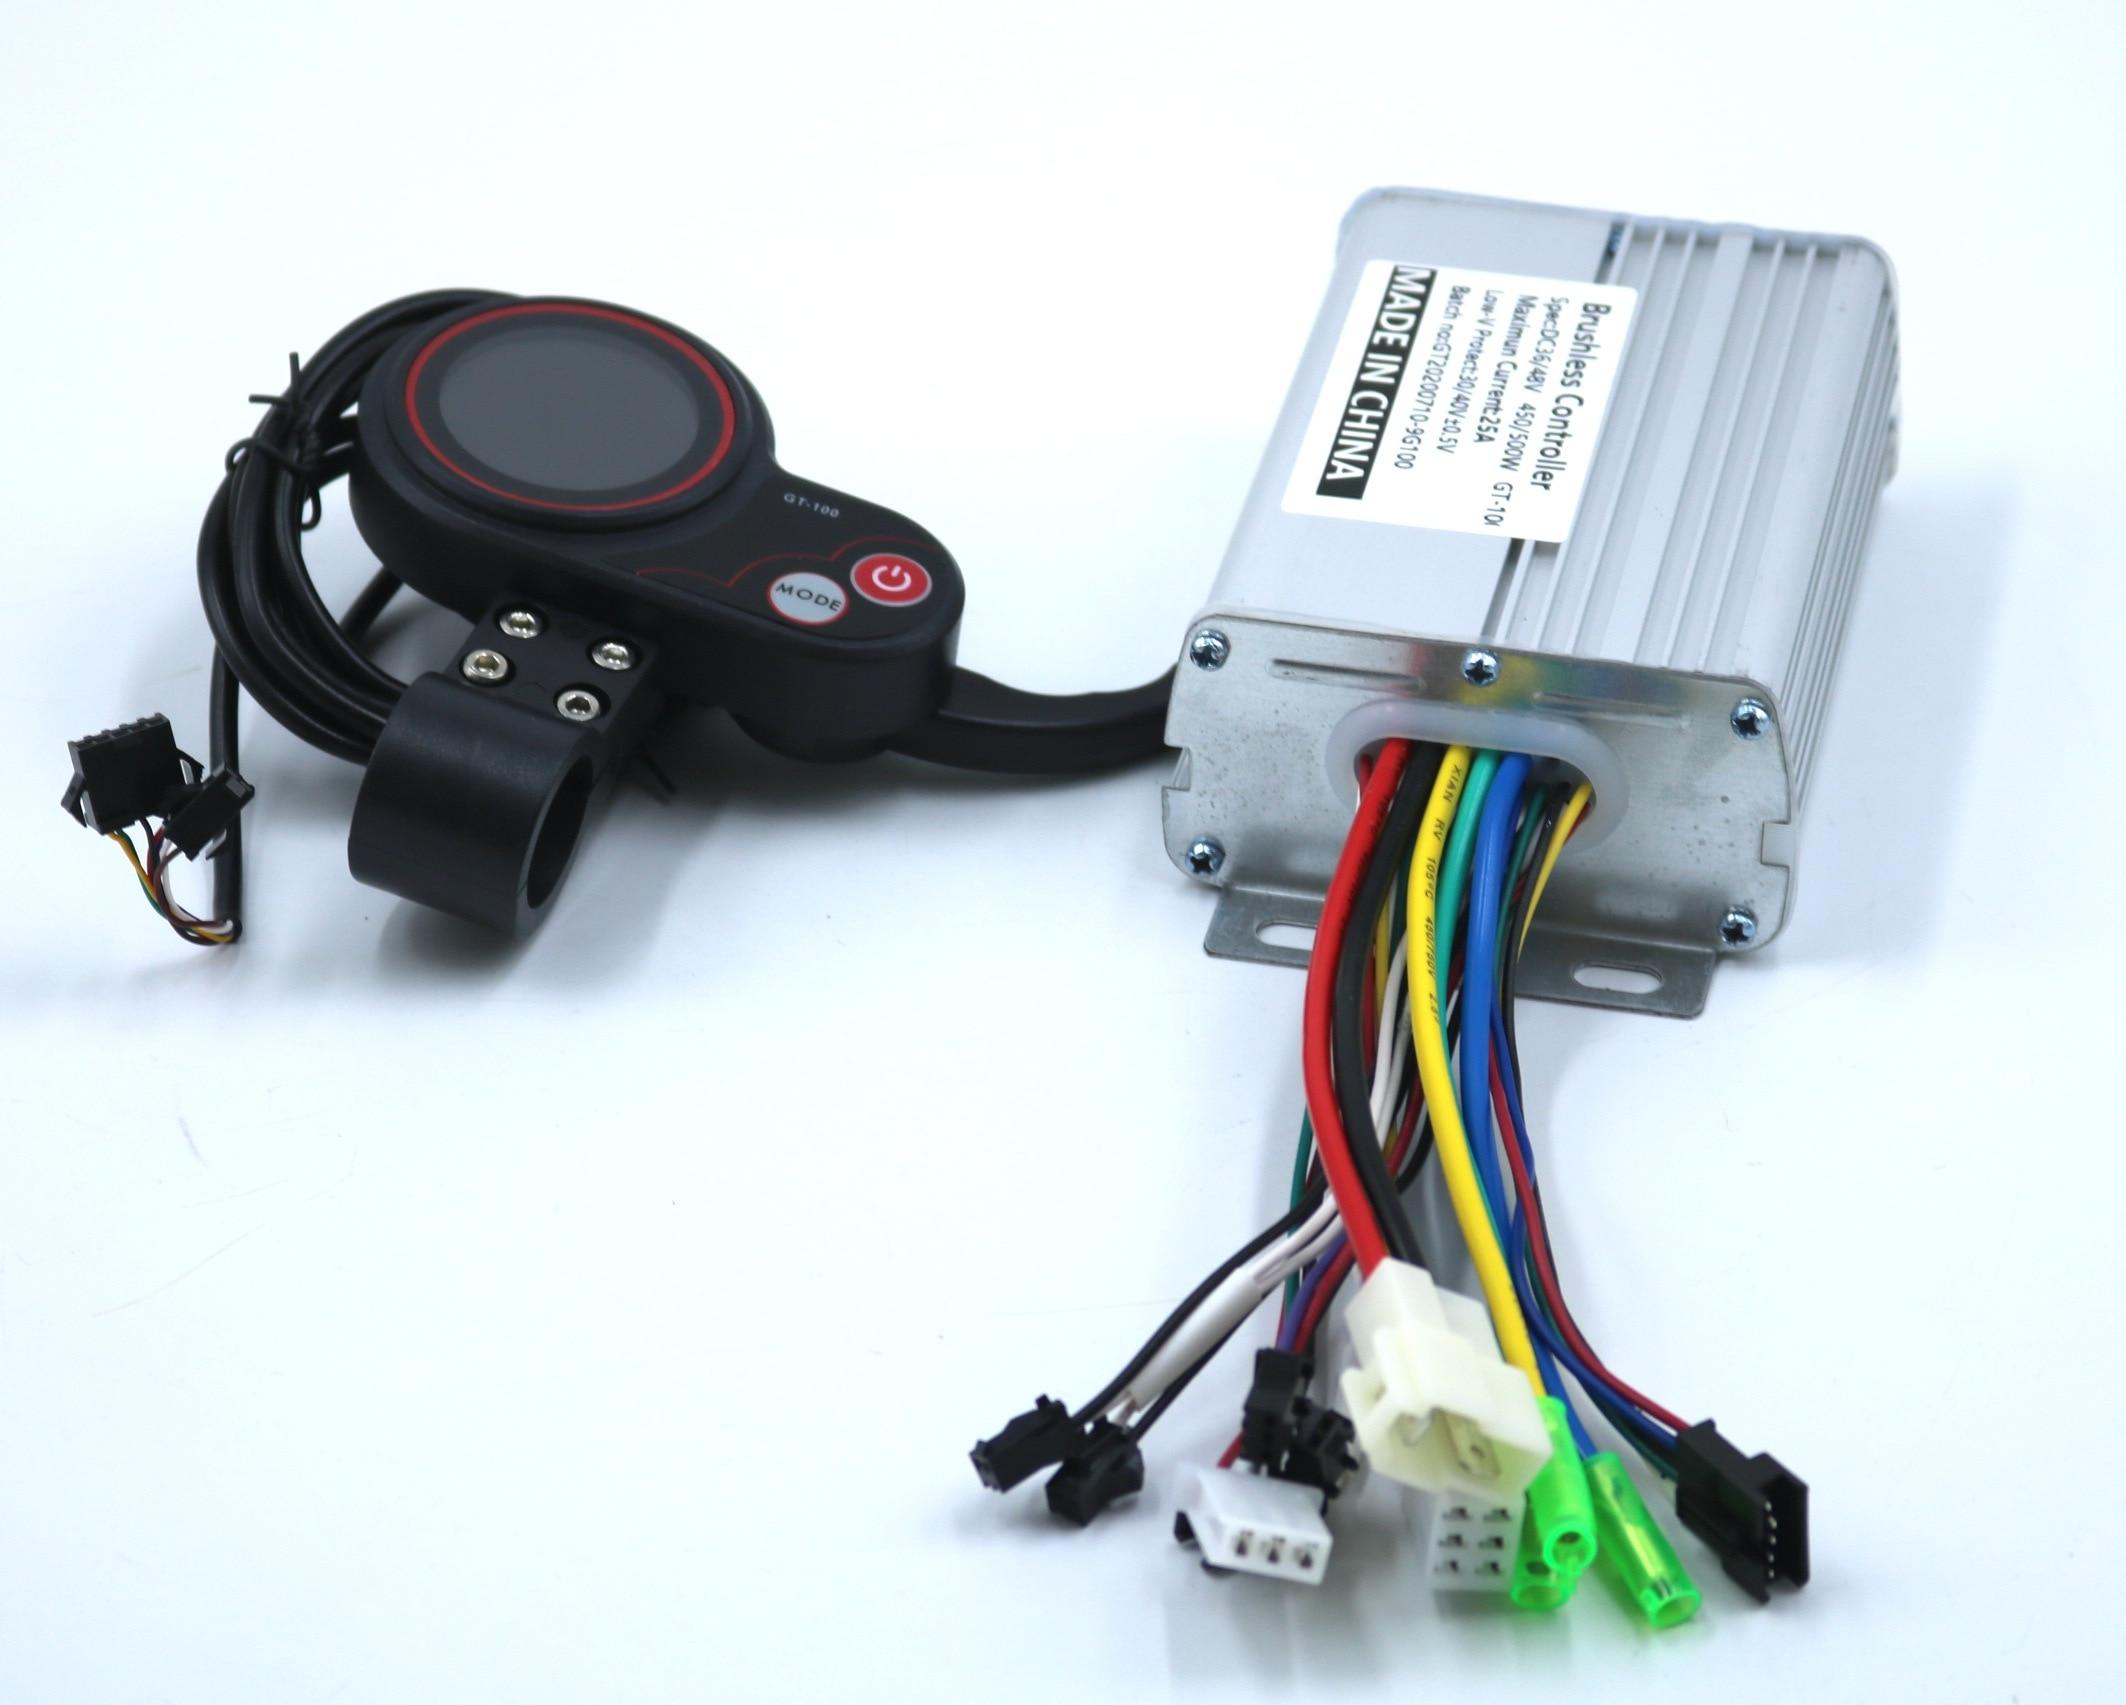 GREENTIME-وحدة تحكم للسكوتر الكهربائي ، محرك بدون فرش ، شاشة LCD ذكية ، 36V/48V/52V/60V 500W 25A BLDC ، مجموعة واحدة